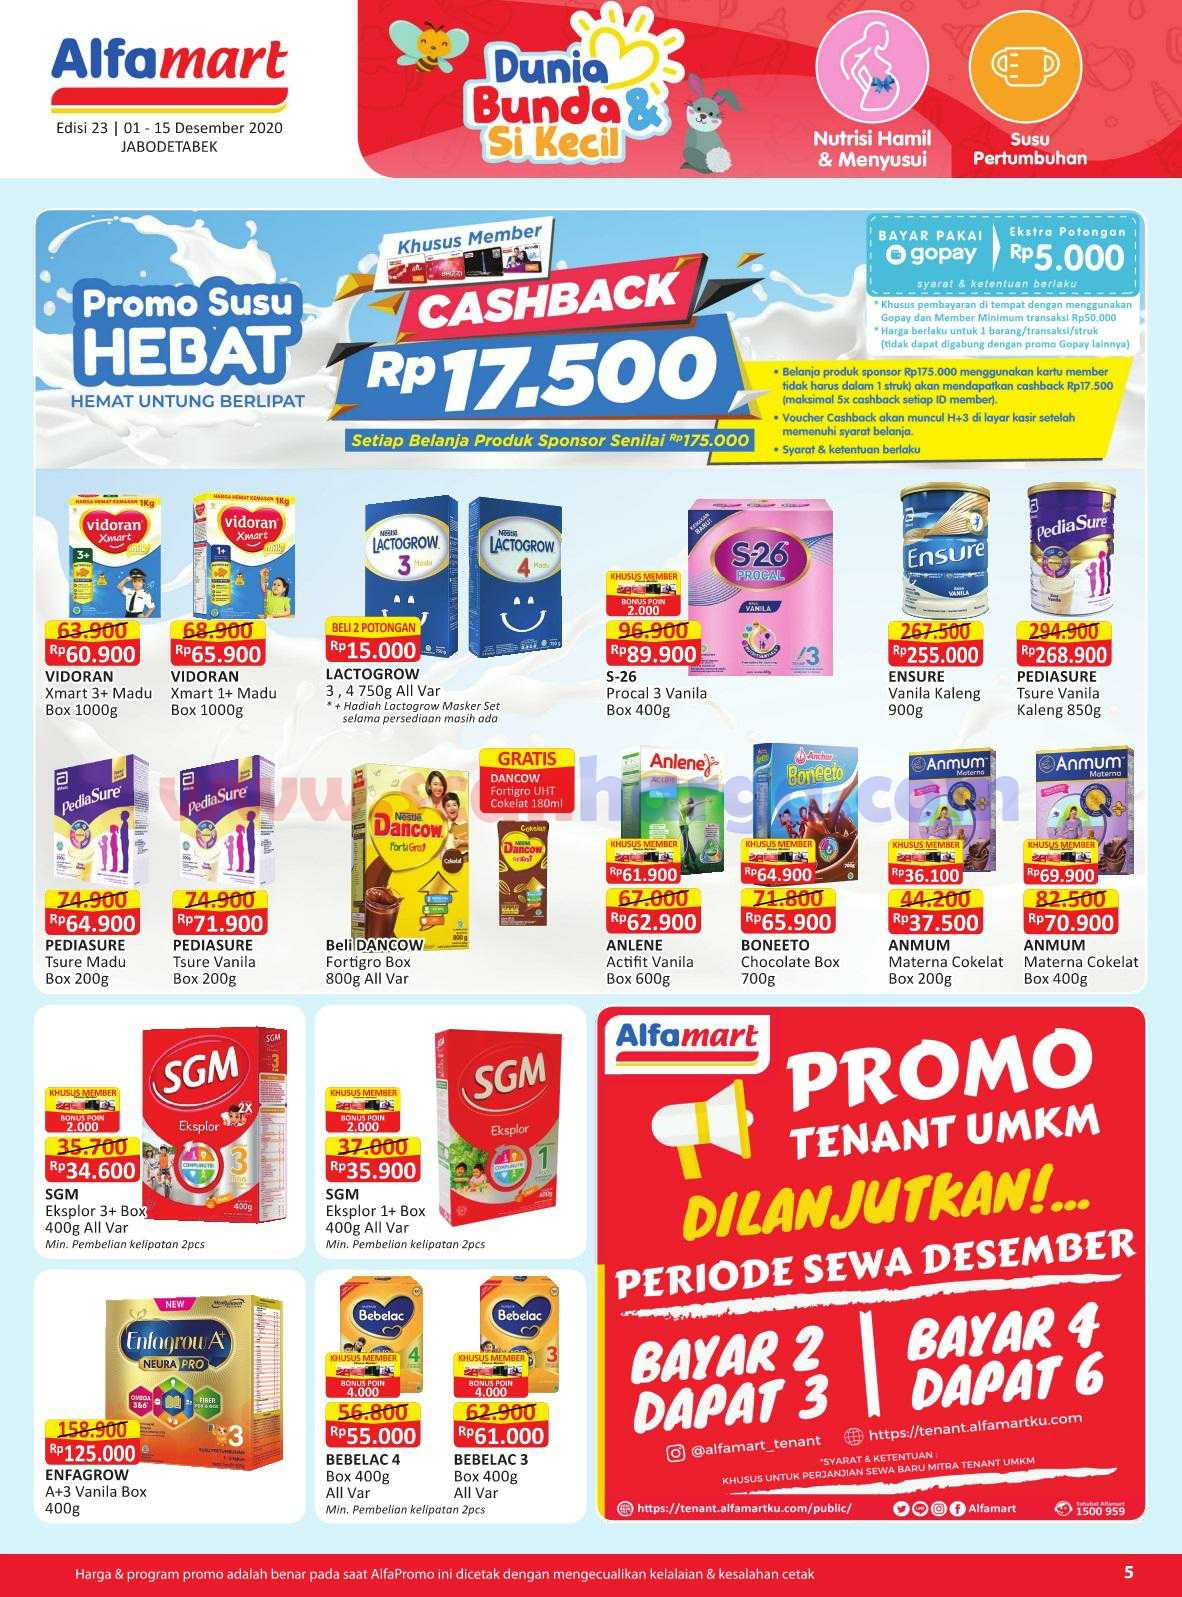 Katalog Promo Alfamart 1 - 15 Desember 2020 5